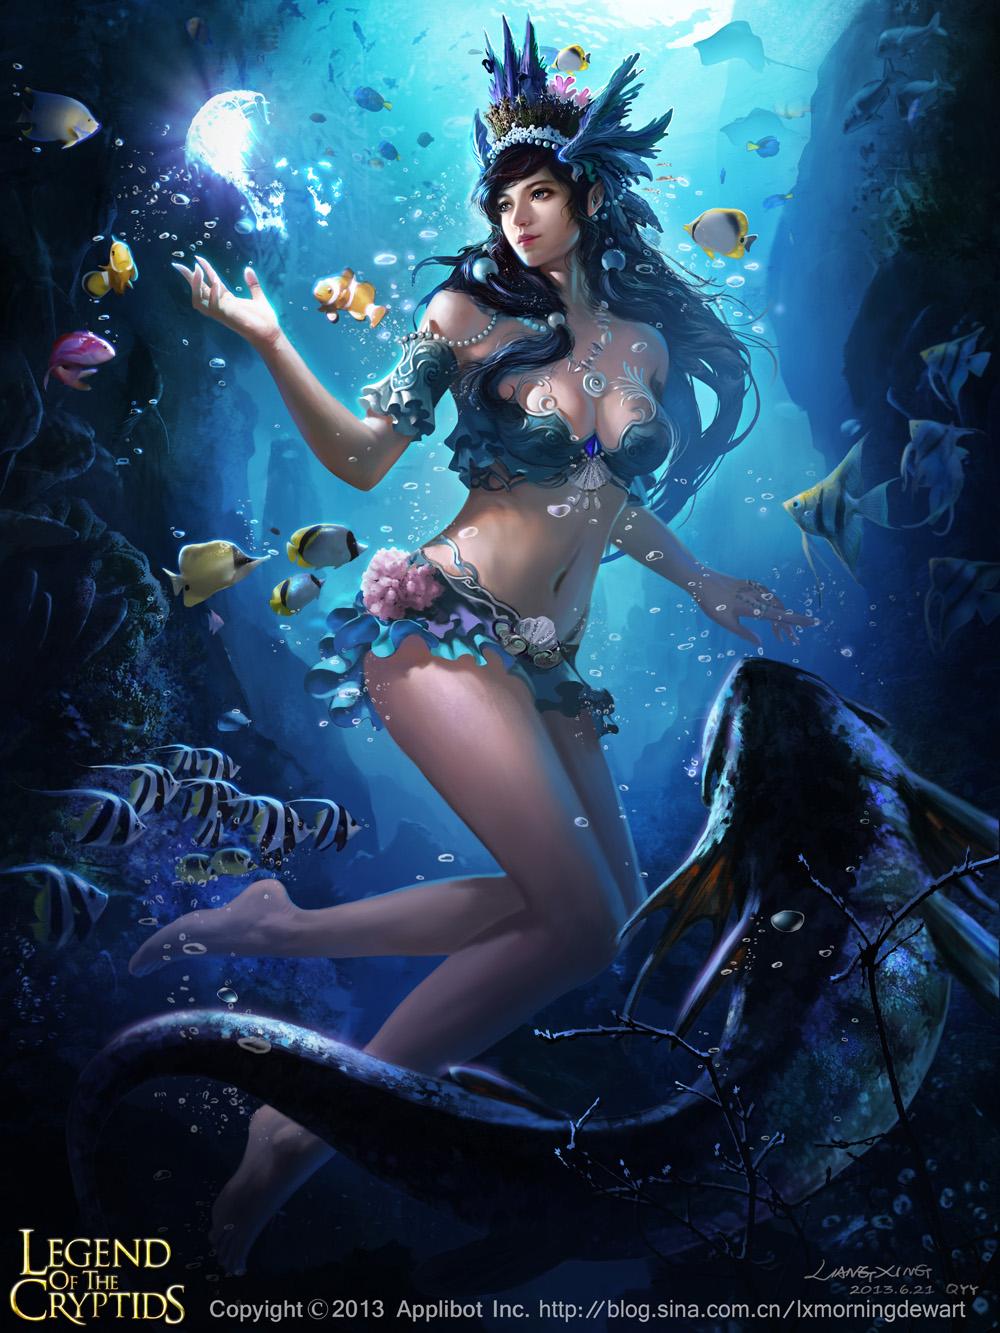 Teal Ocean Banquet-adv by liangxinxin